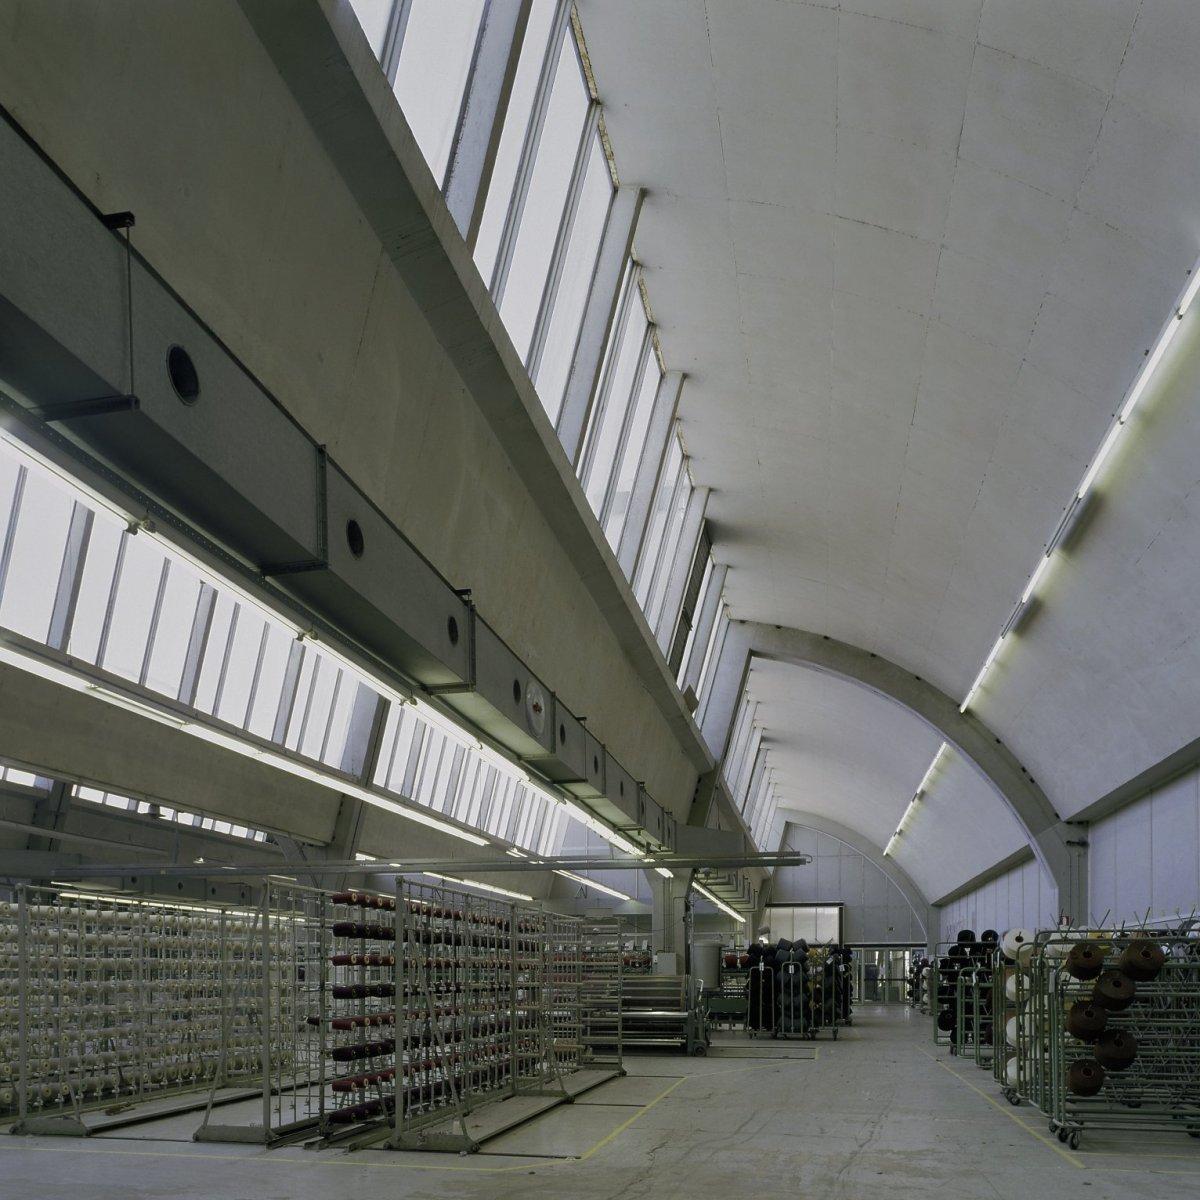 Fábrica de tejido De Ploeg (actualmente Bruns)